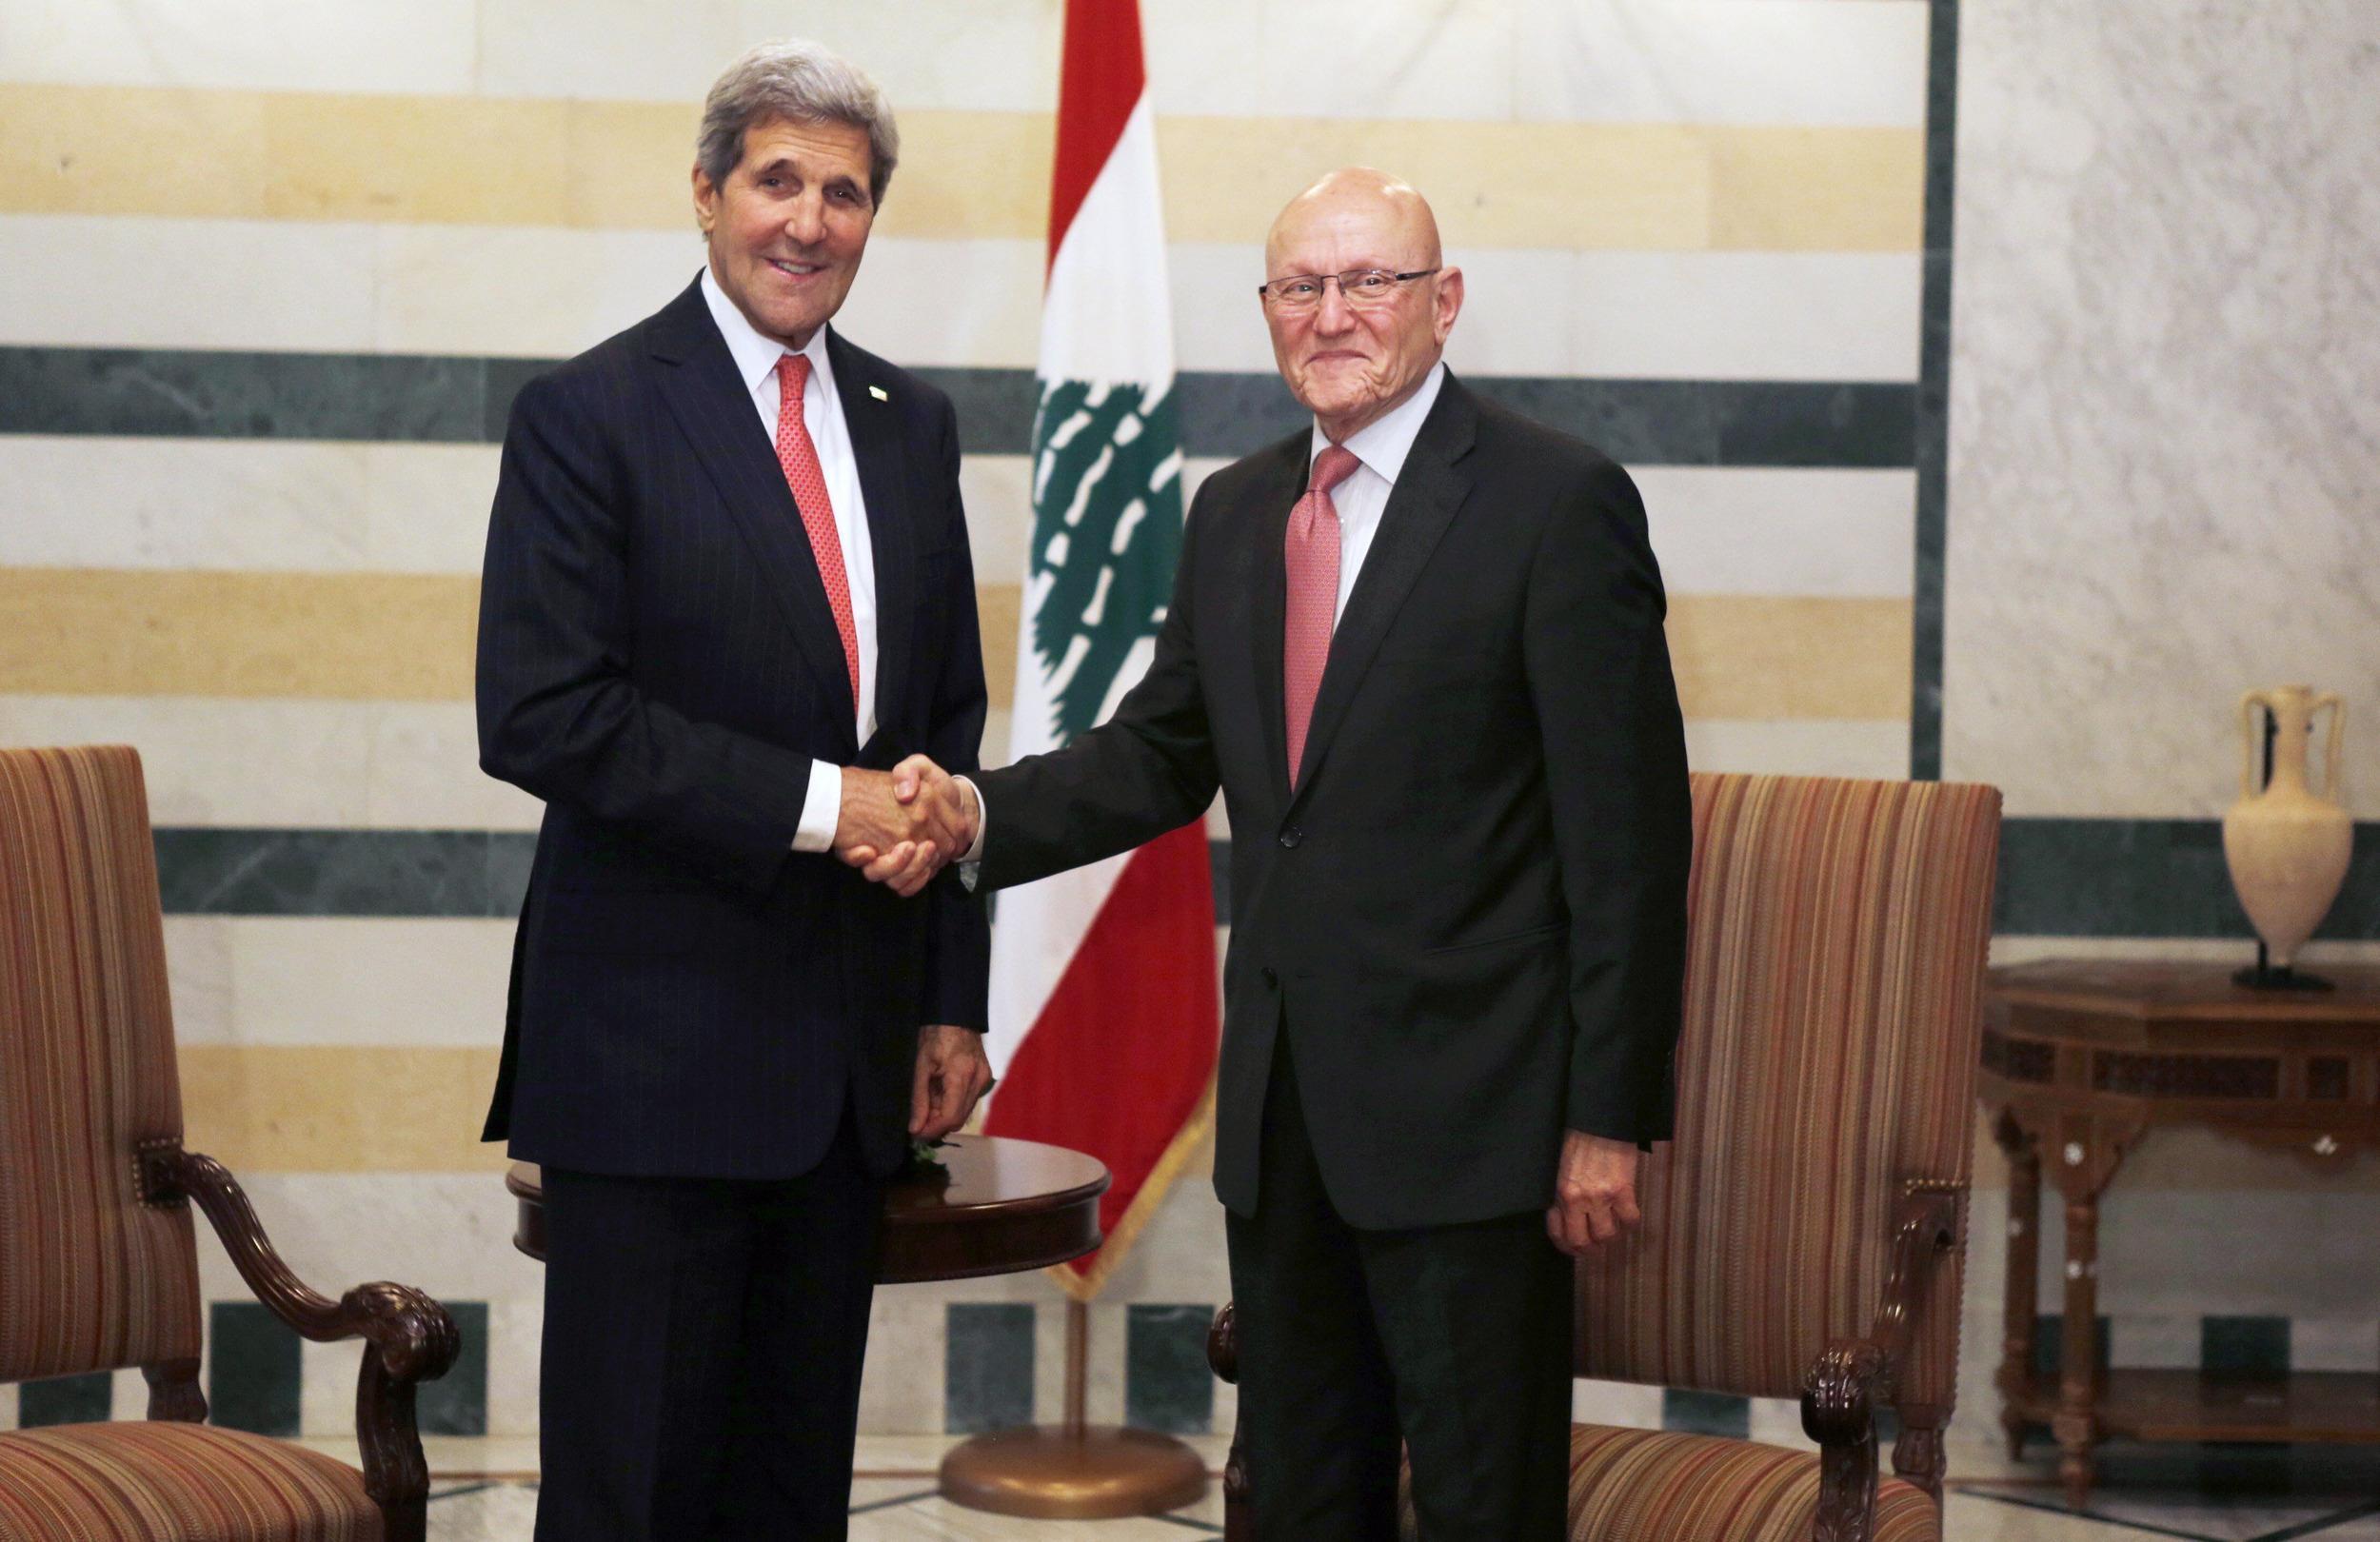 Image: LEBANON-US-DIPLOMACY-SYRIA